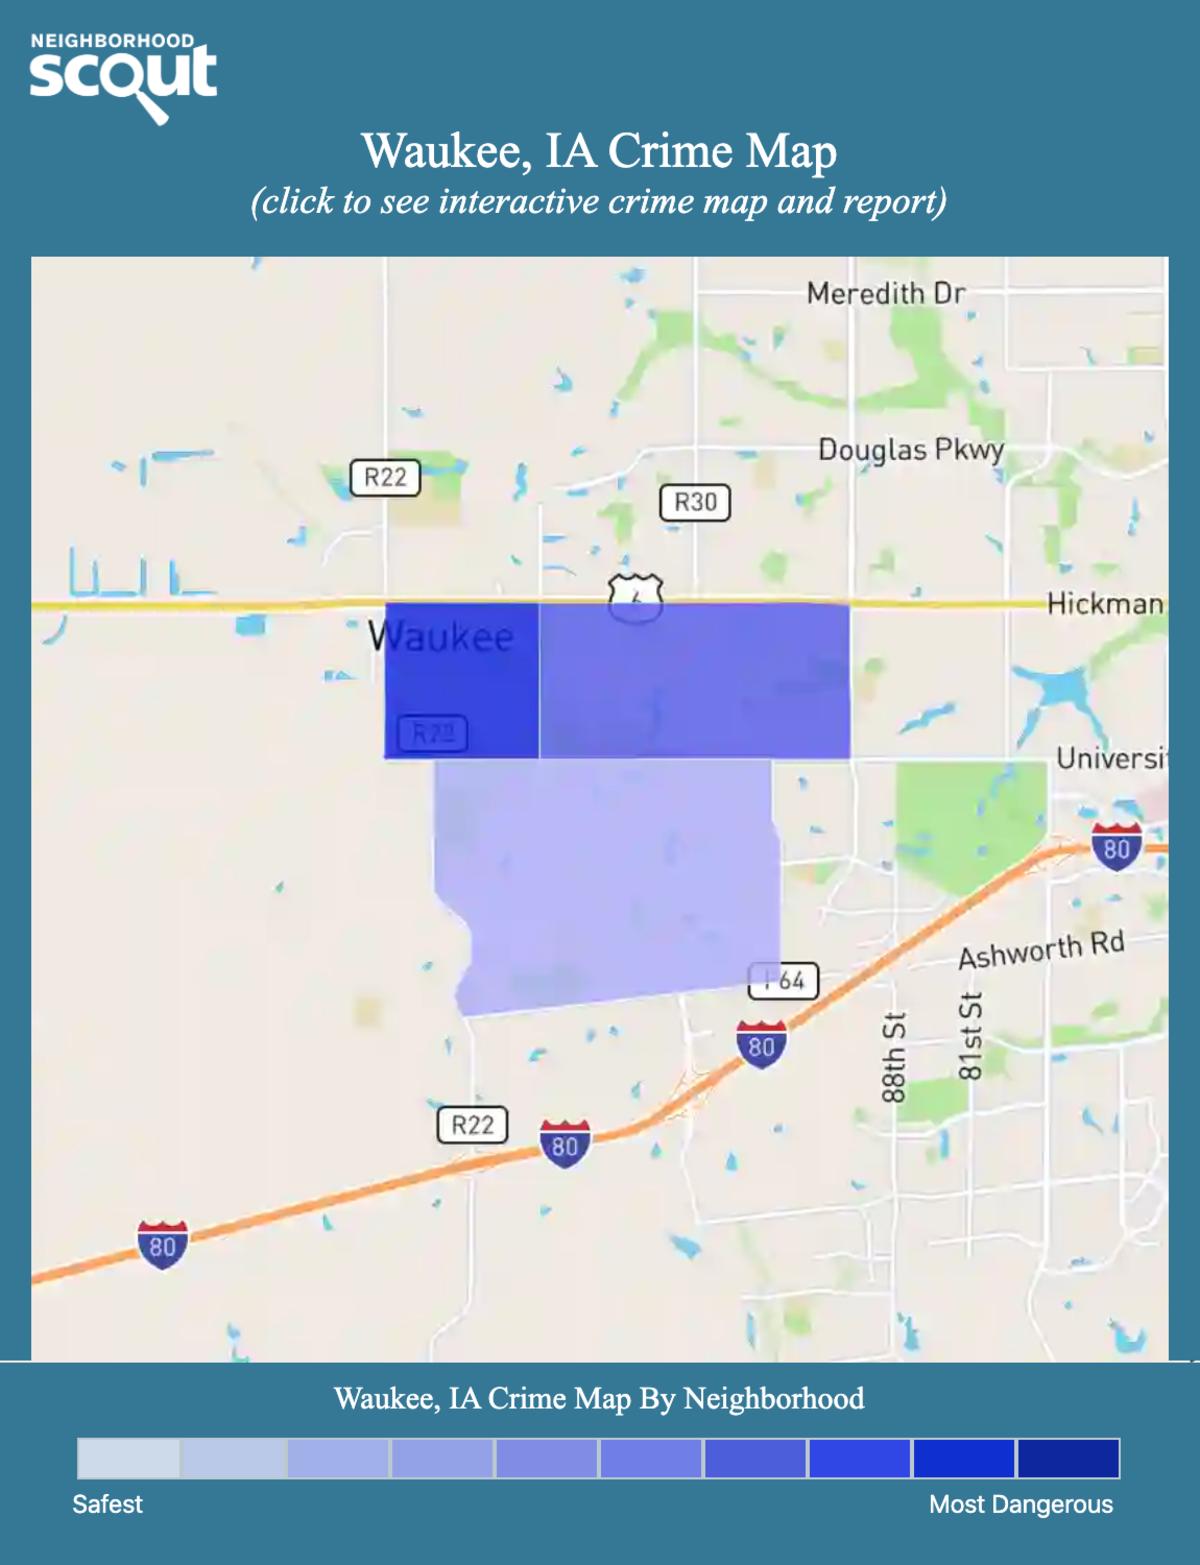 Waukee, Iowa crime map